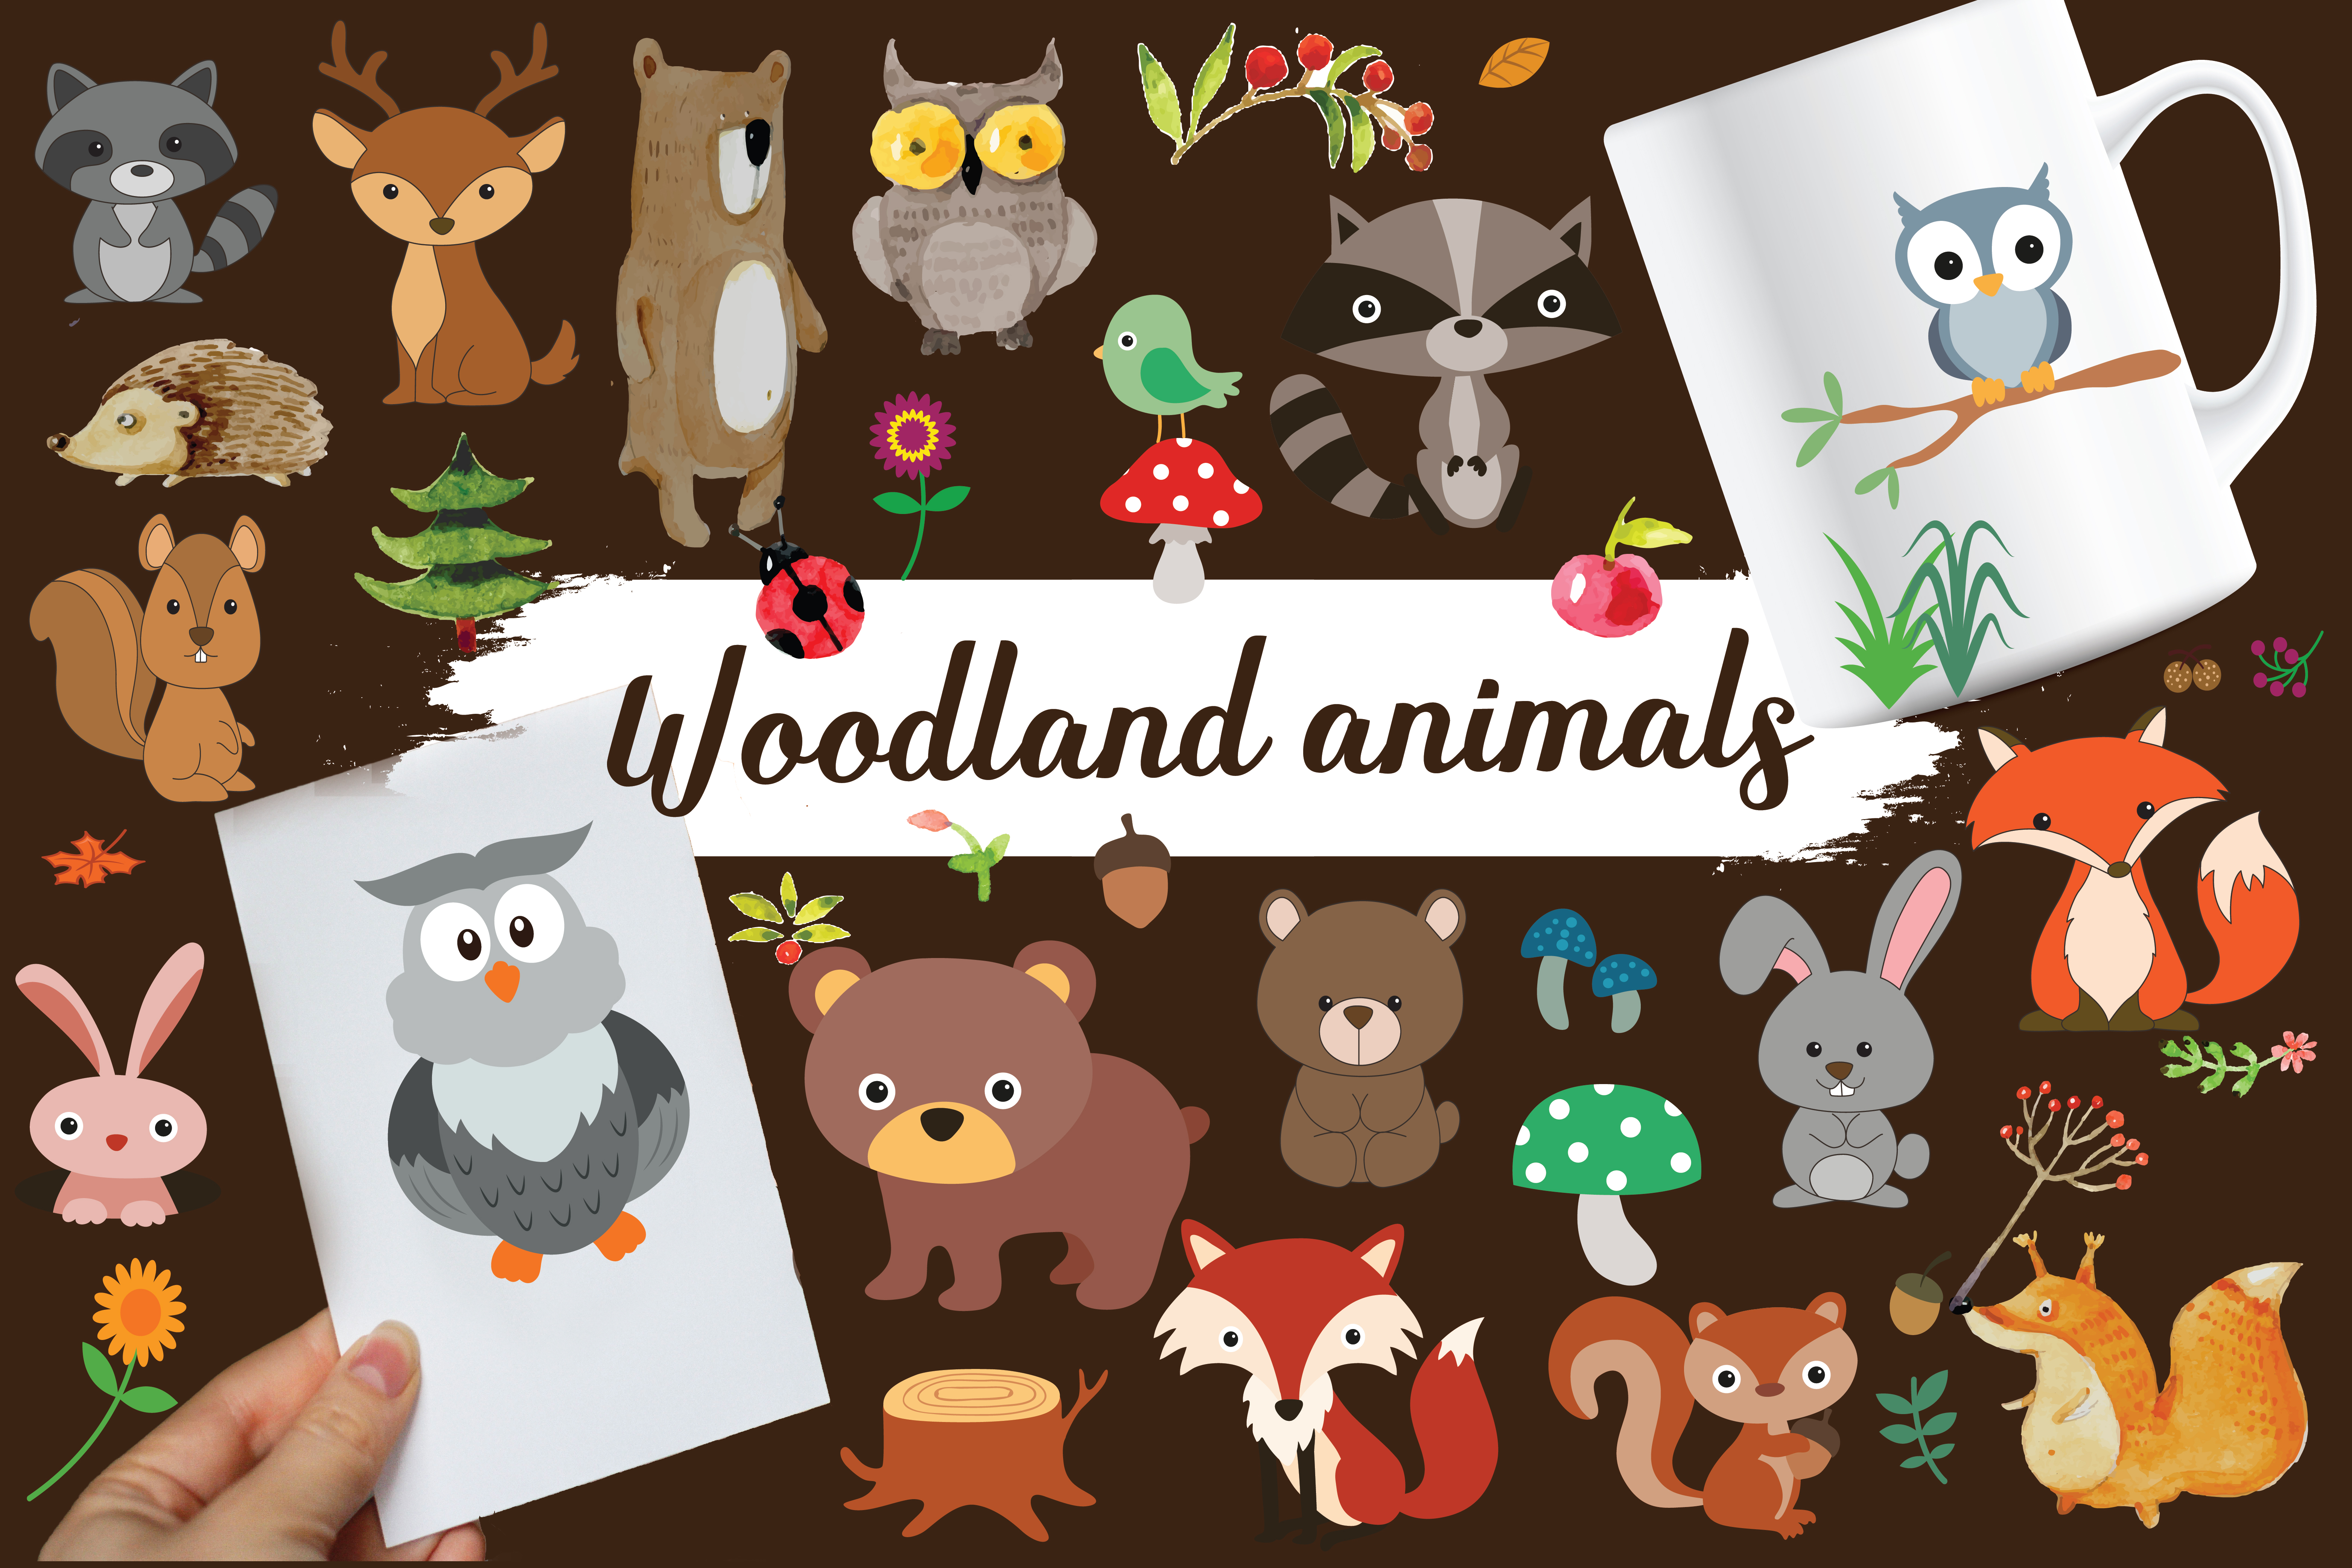 wood land animals,woodland,animals,forest animals,forest,animals,animal,fox,owl,bear example image 1